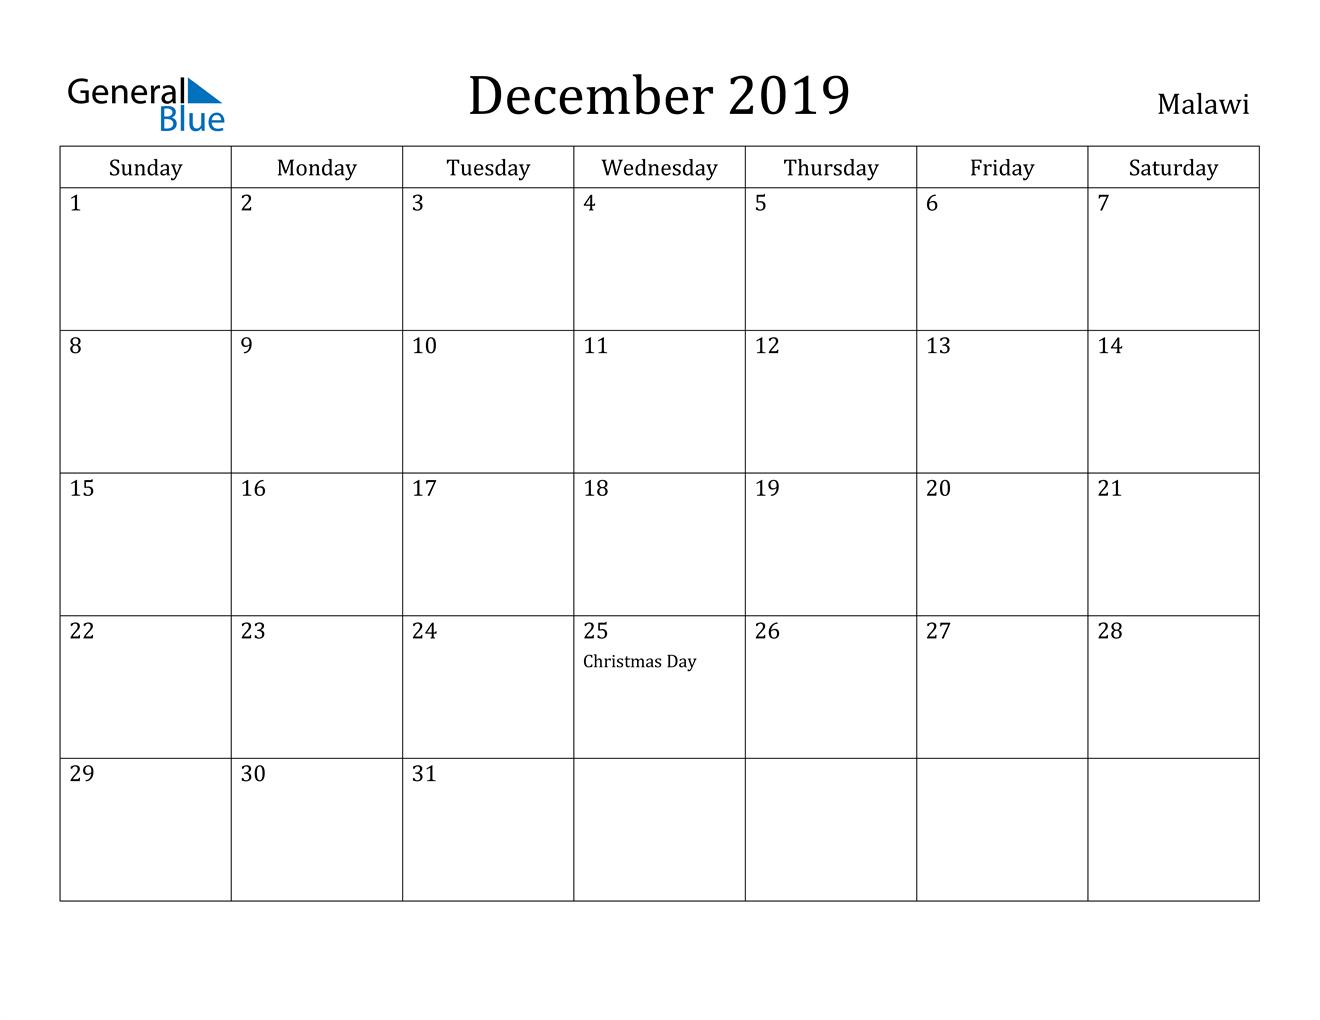 Image of December 2019 Malawi Calendar with Holidays Calendar